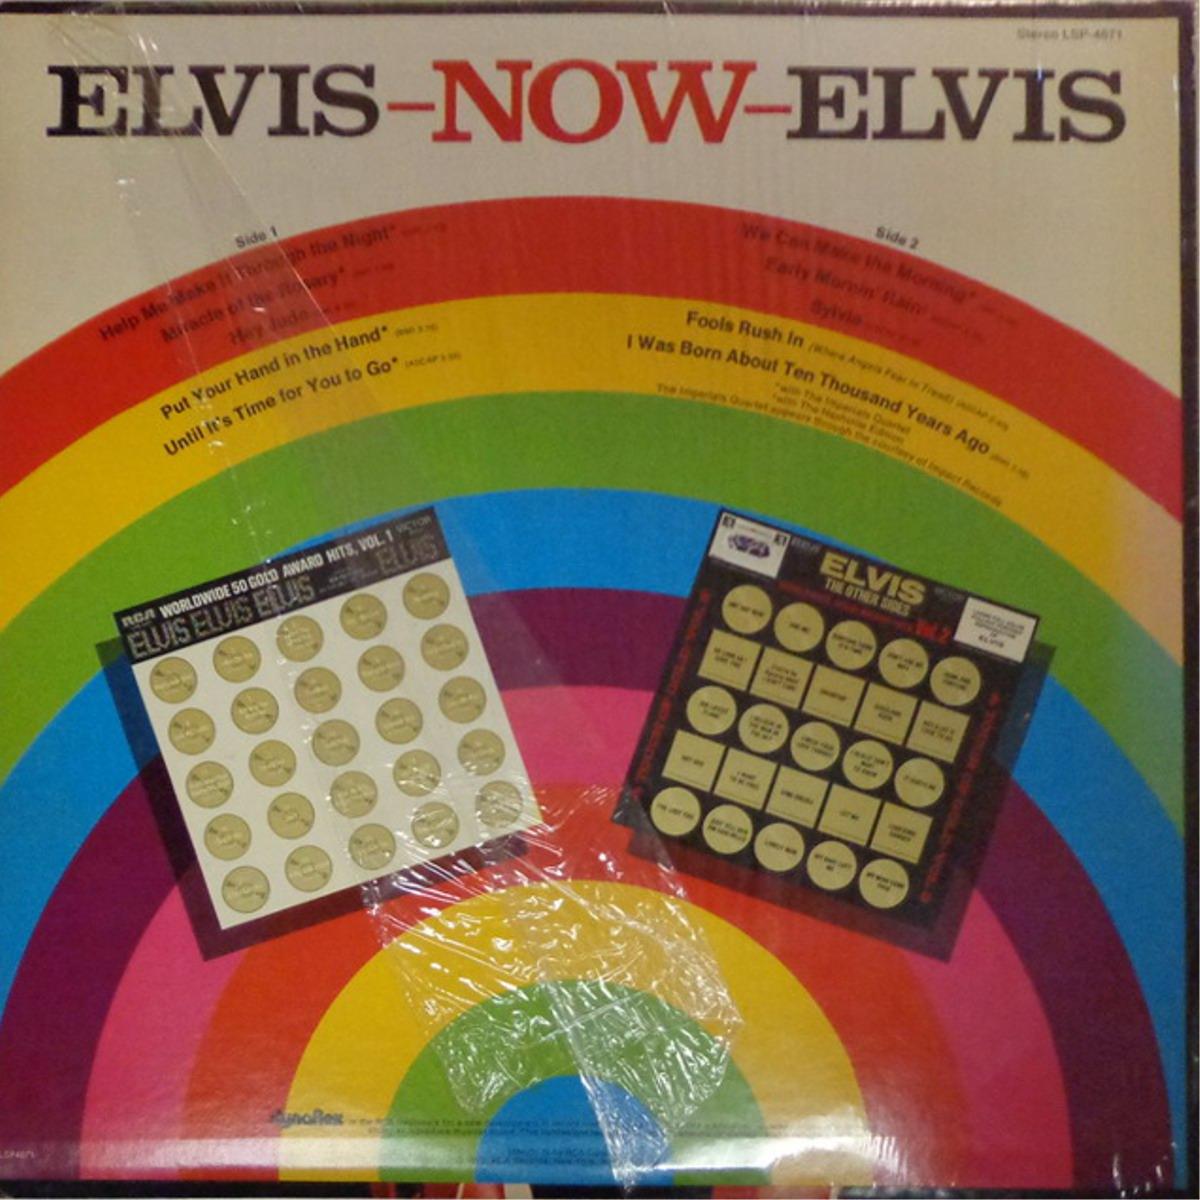 ELVIS NOW Lsp-4671bbsu7y